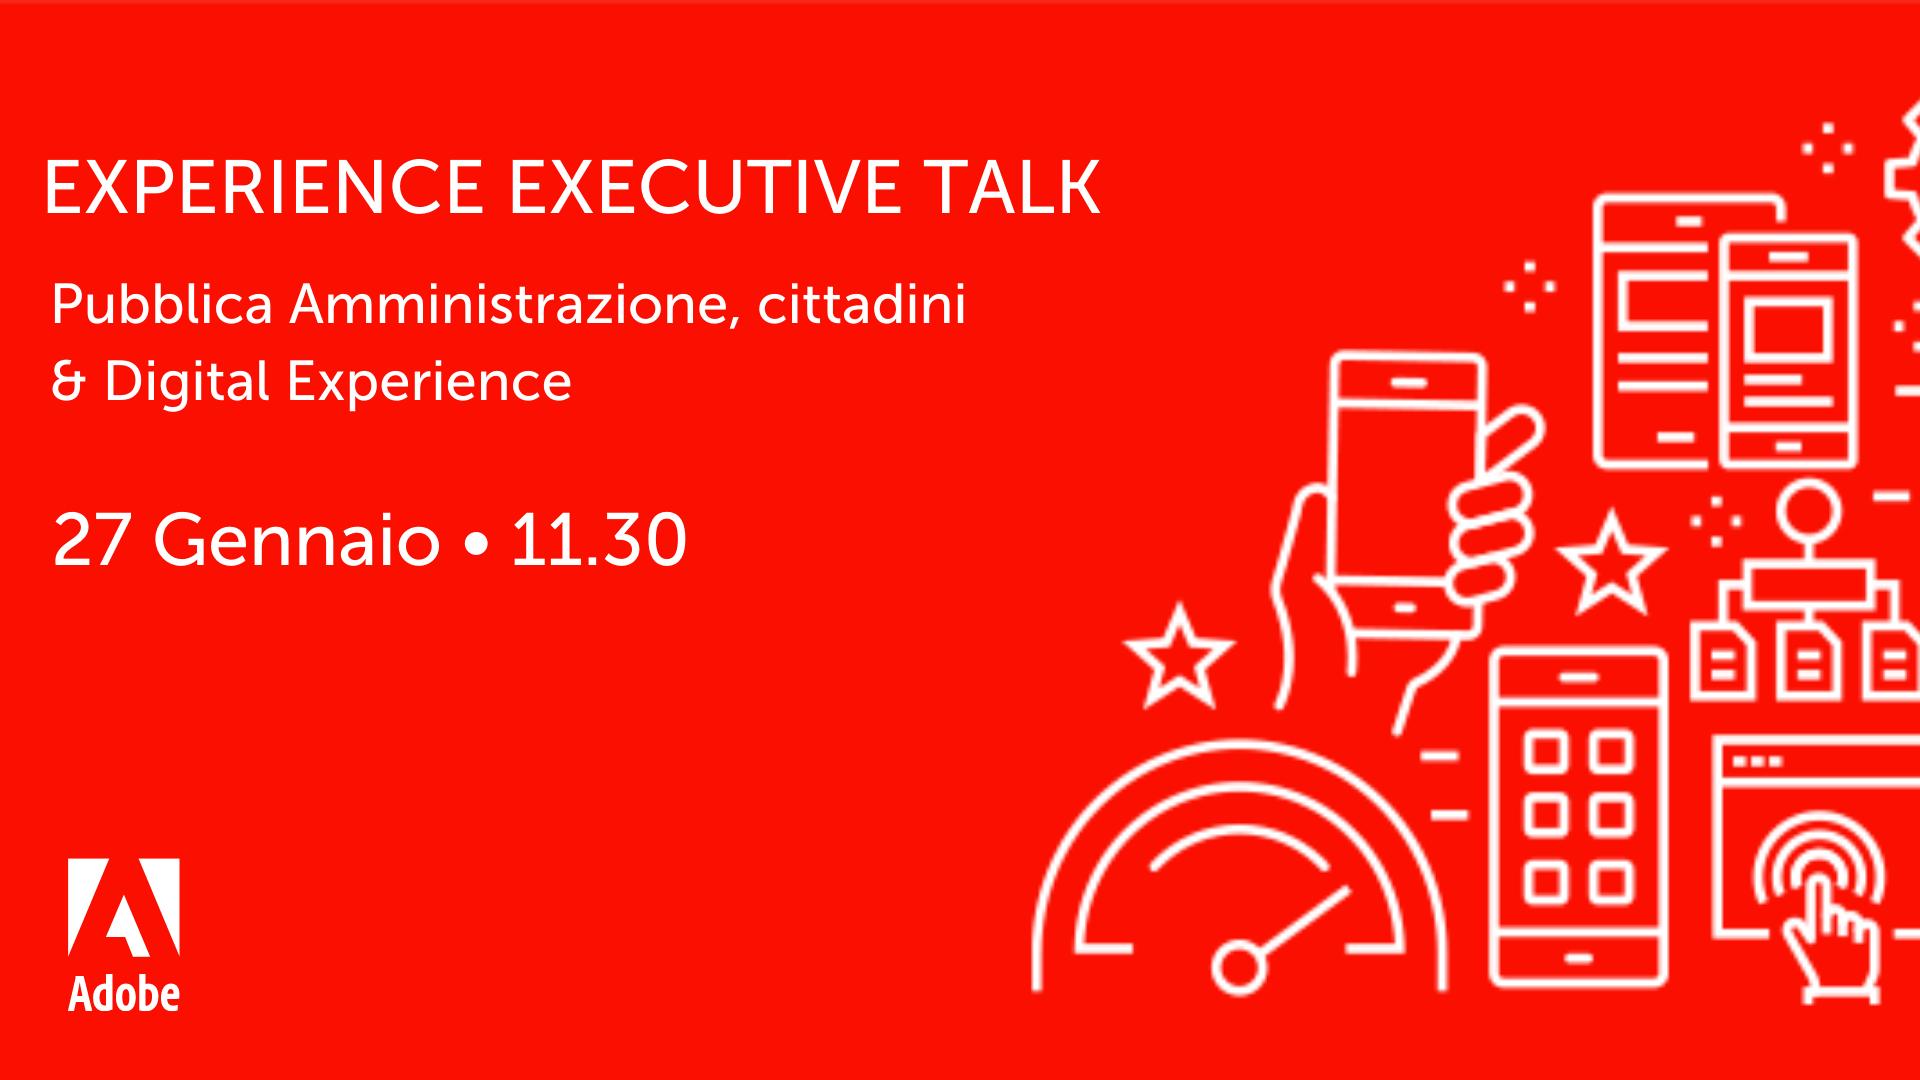 EXPERIENCE EXECUTIVE TALK (1)